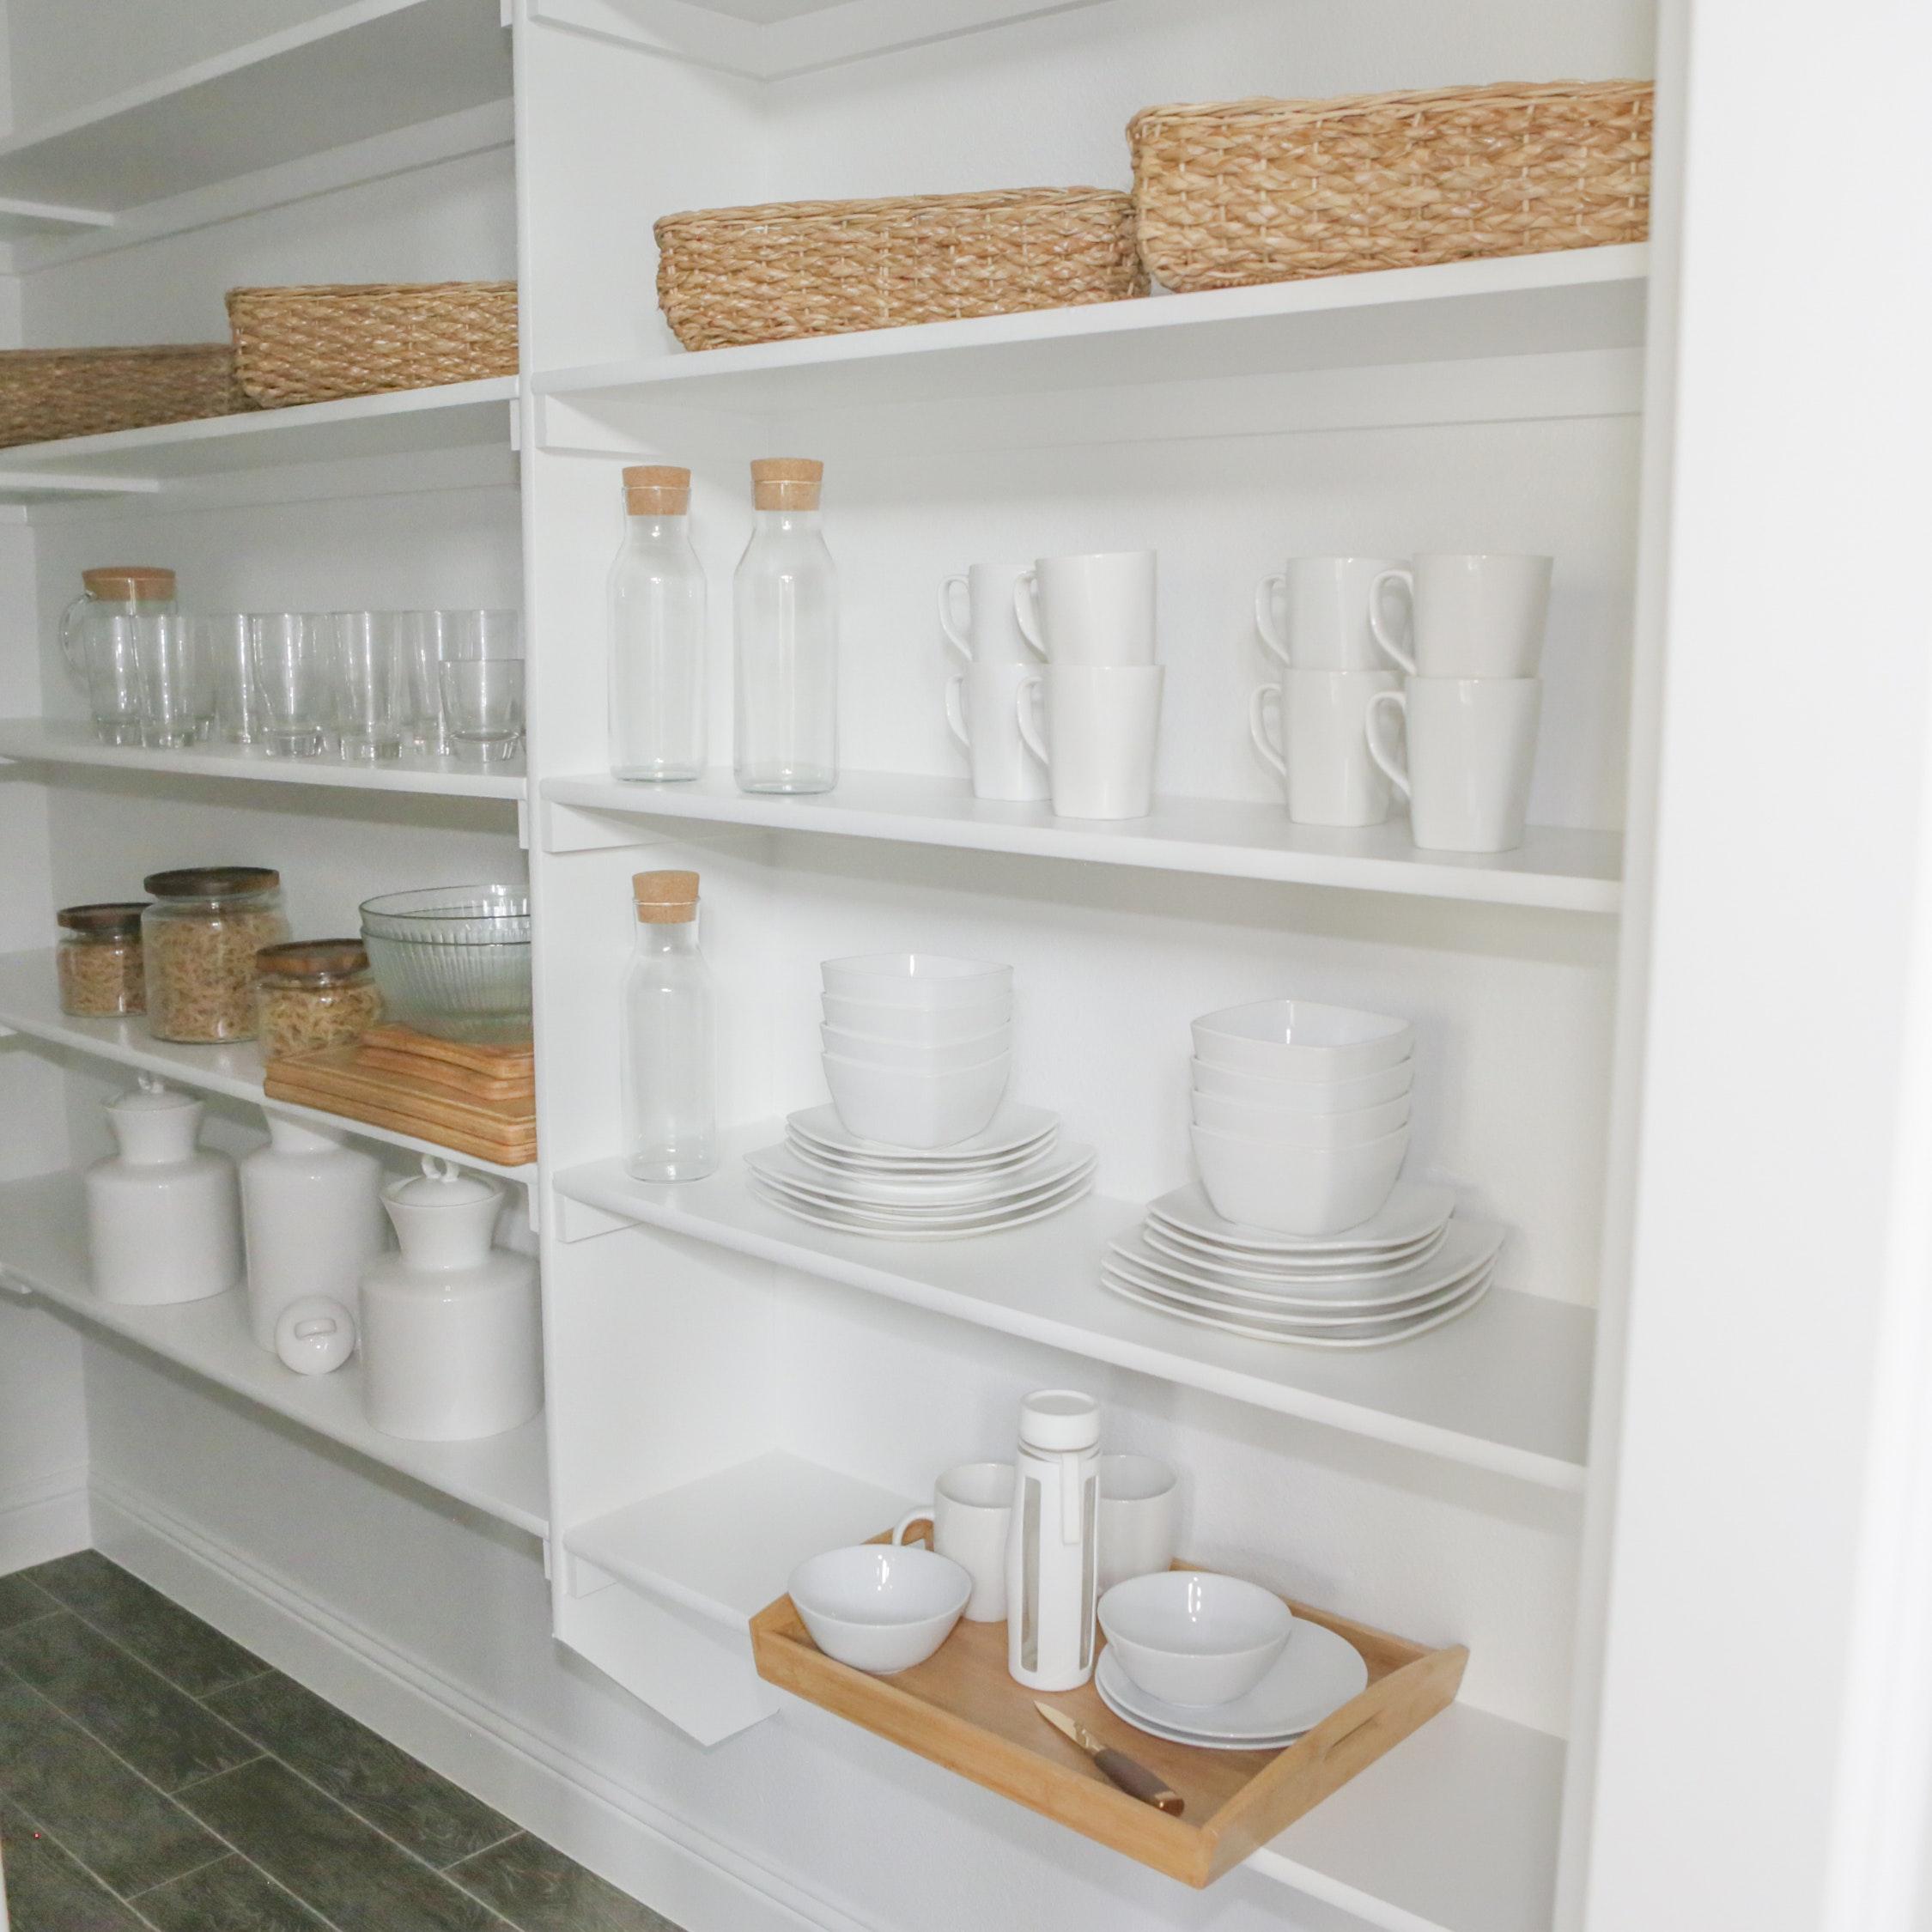 Ceramic Tableware, Glassware and Baskets